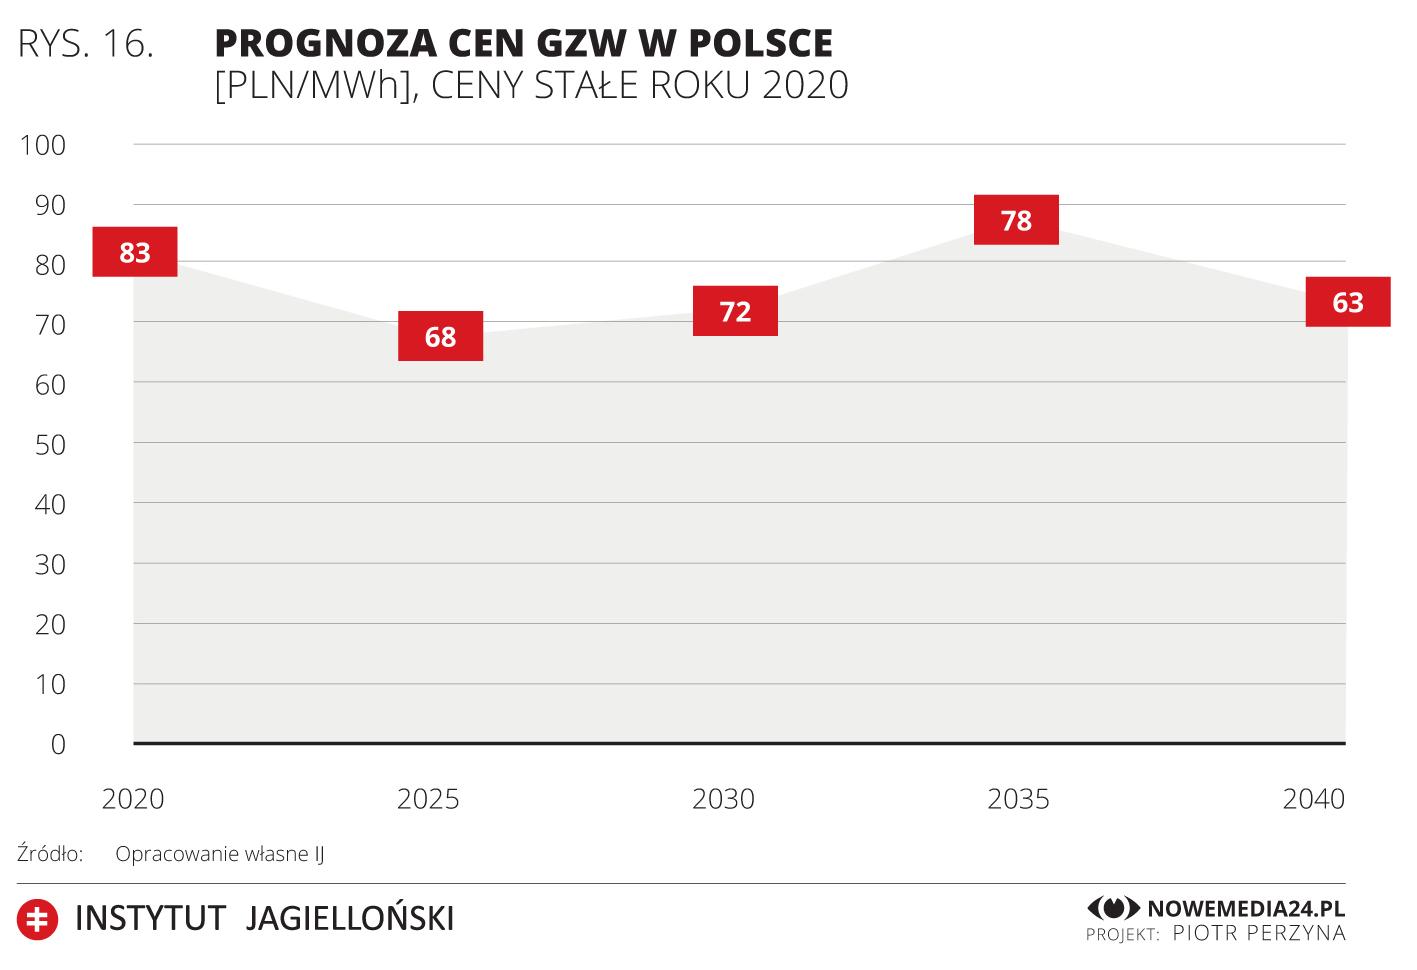 Prognoza cen GZW w Polsce